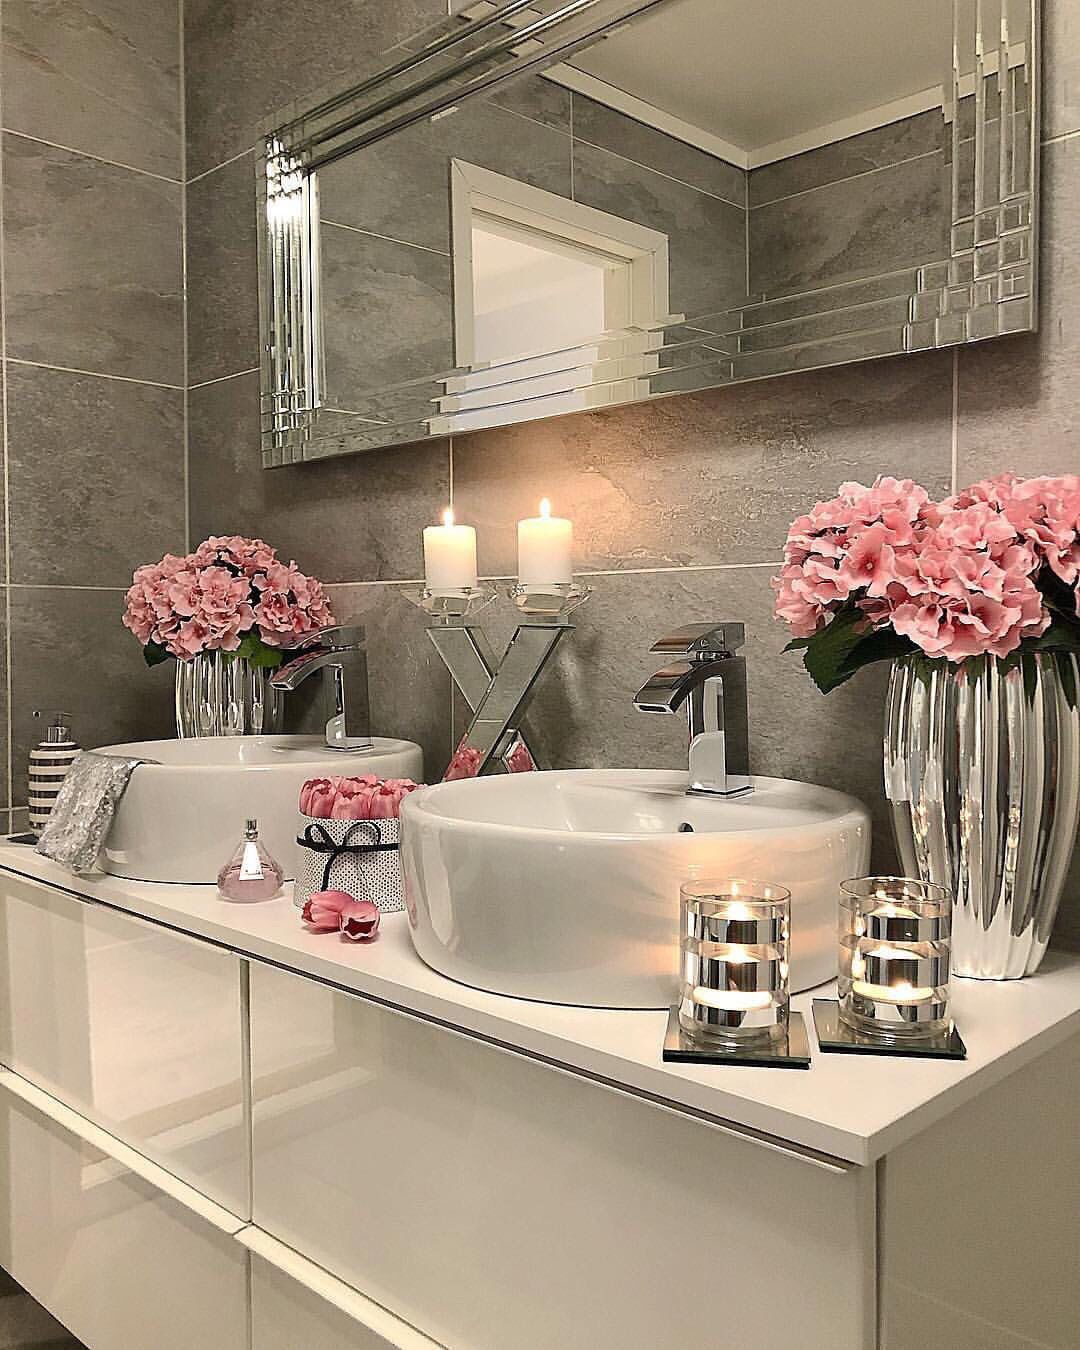 10+ Simple And Futuristic Bathroom Remodeling Ideas